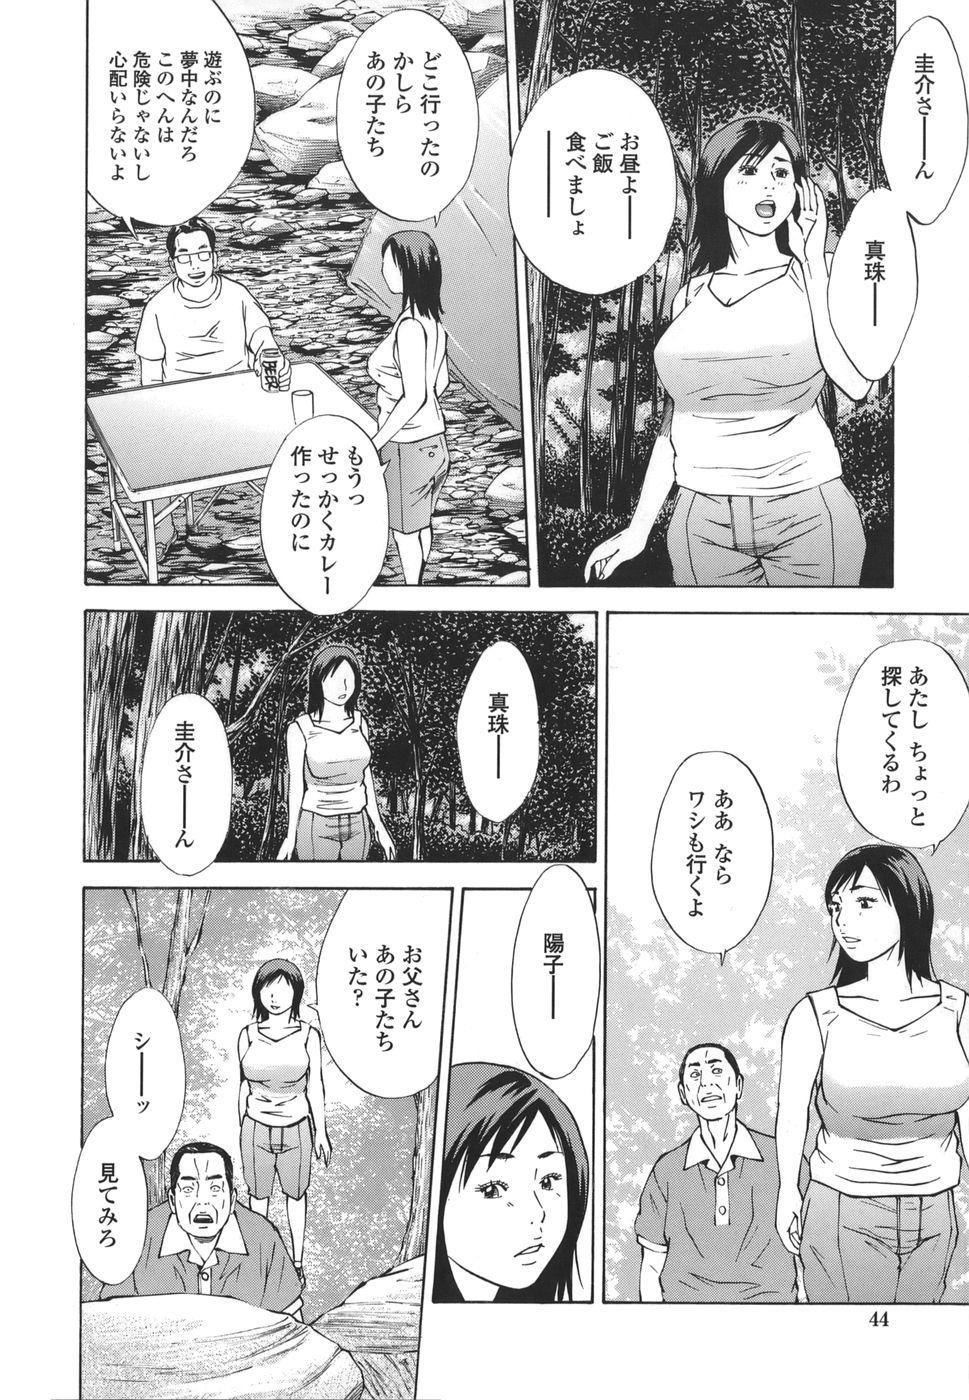 Kinshin Goukan - Near Relation Rapes 43